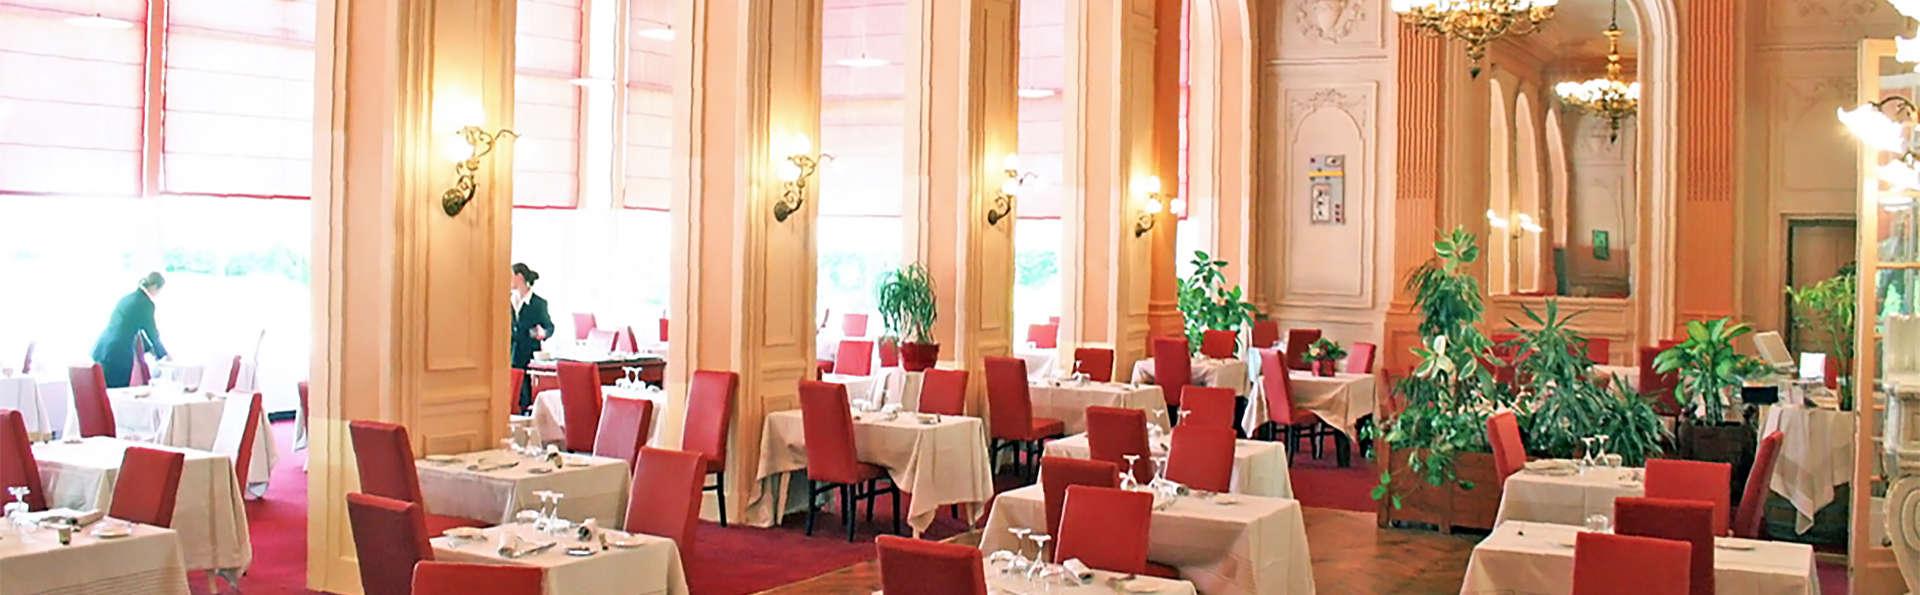 Week-end avec dîner au coeur des Vosges